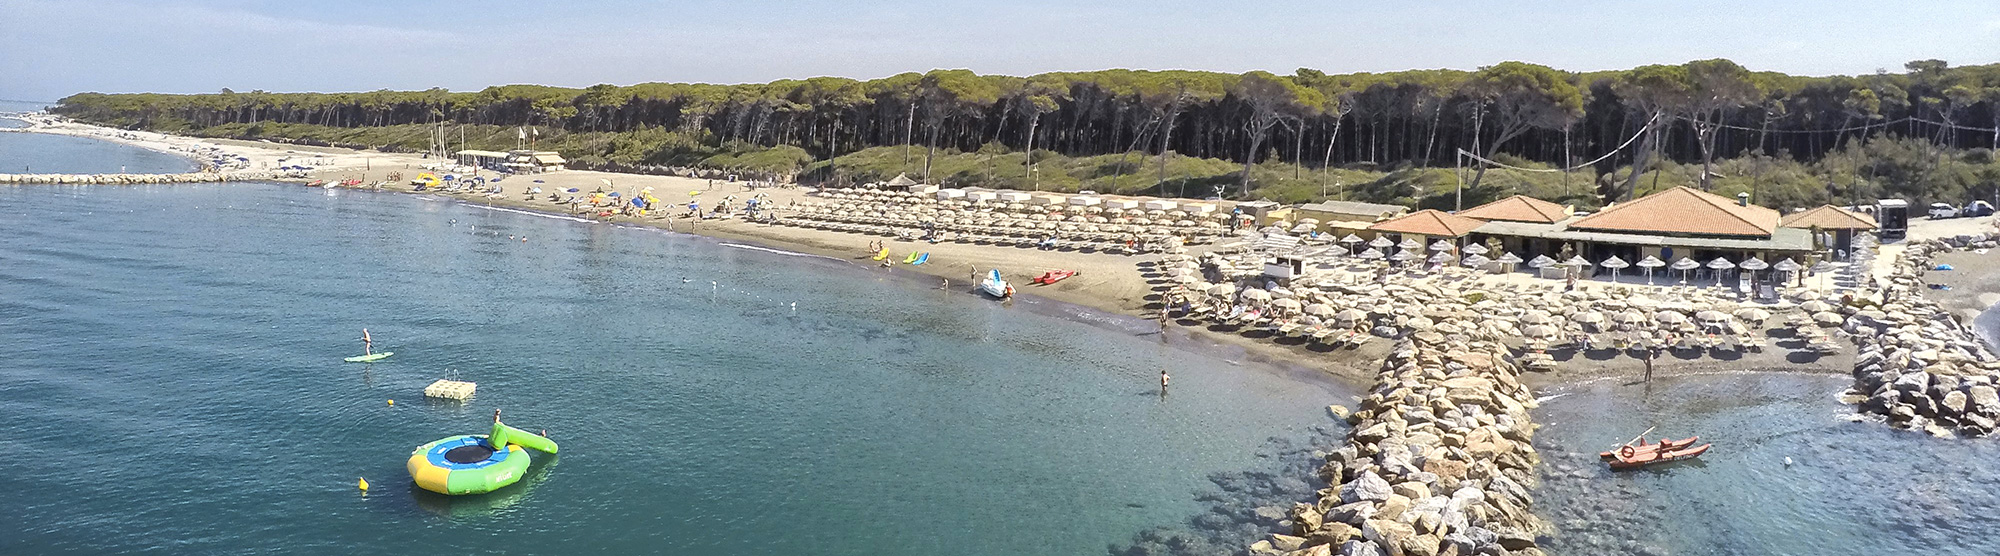 Stabilimento balneare cecina mare toscana